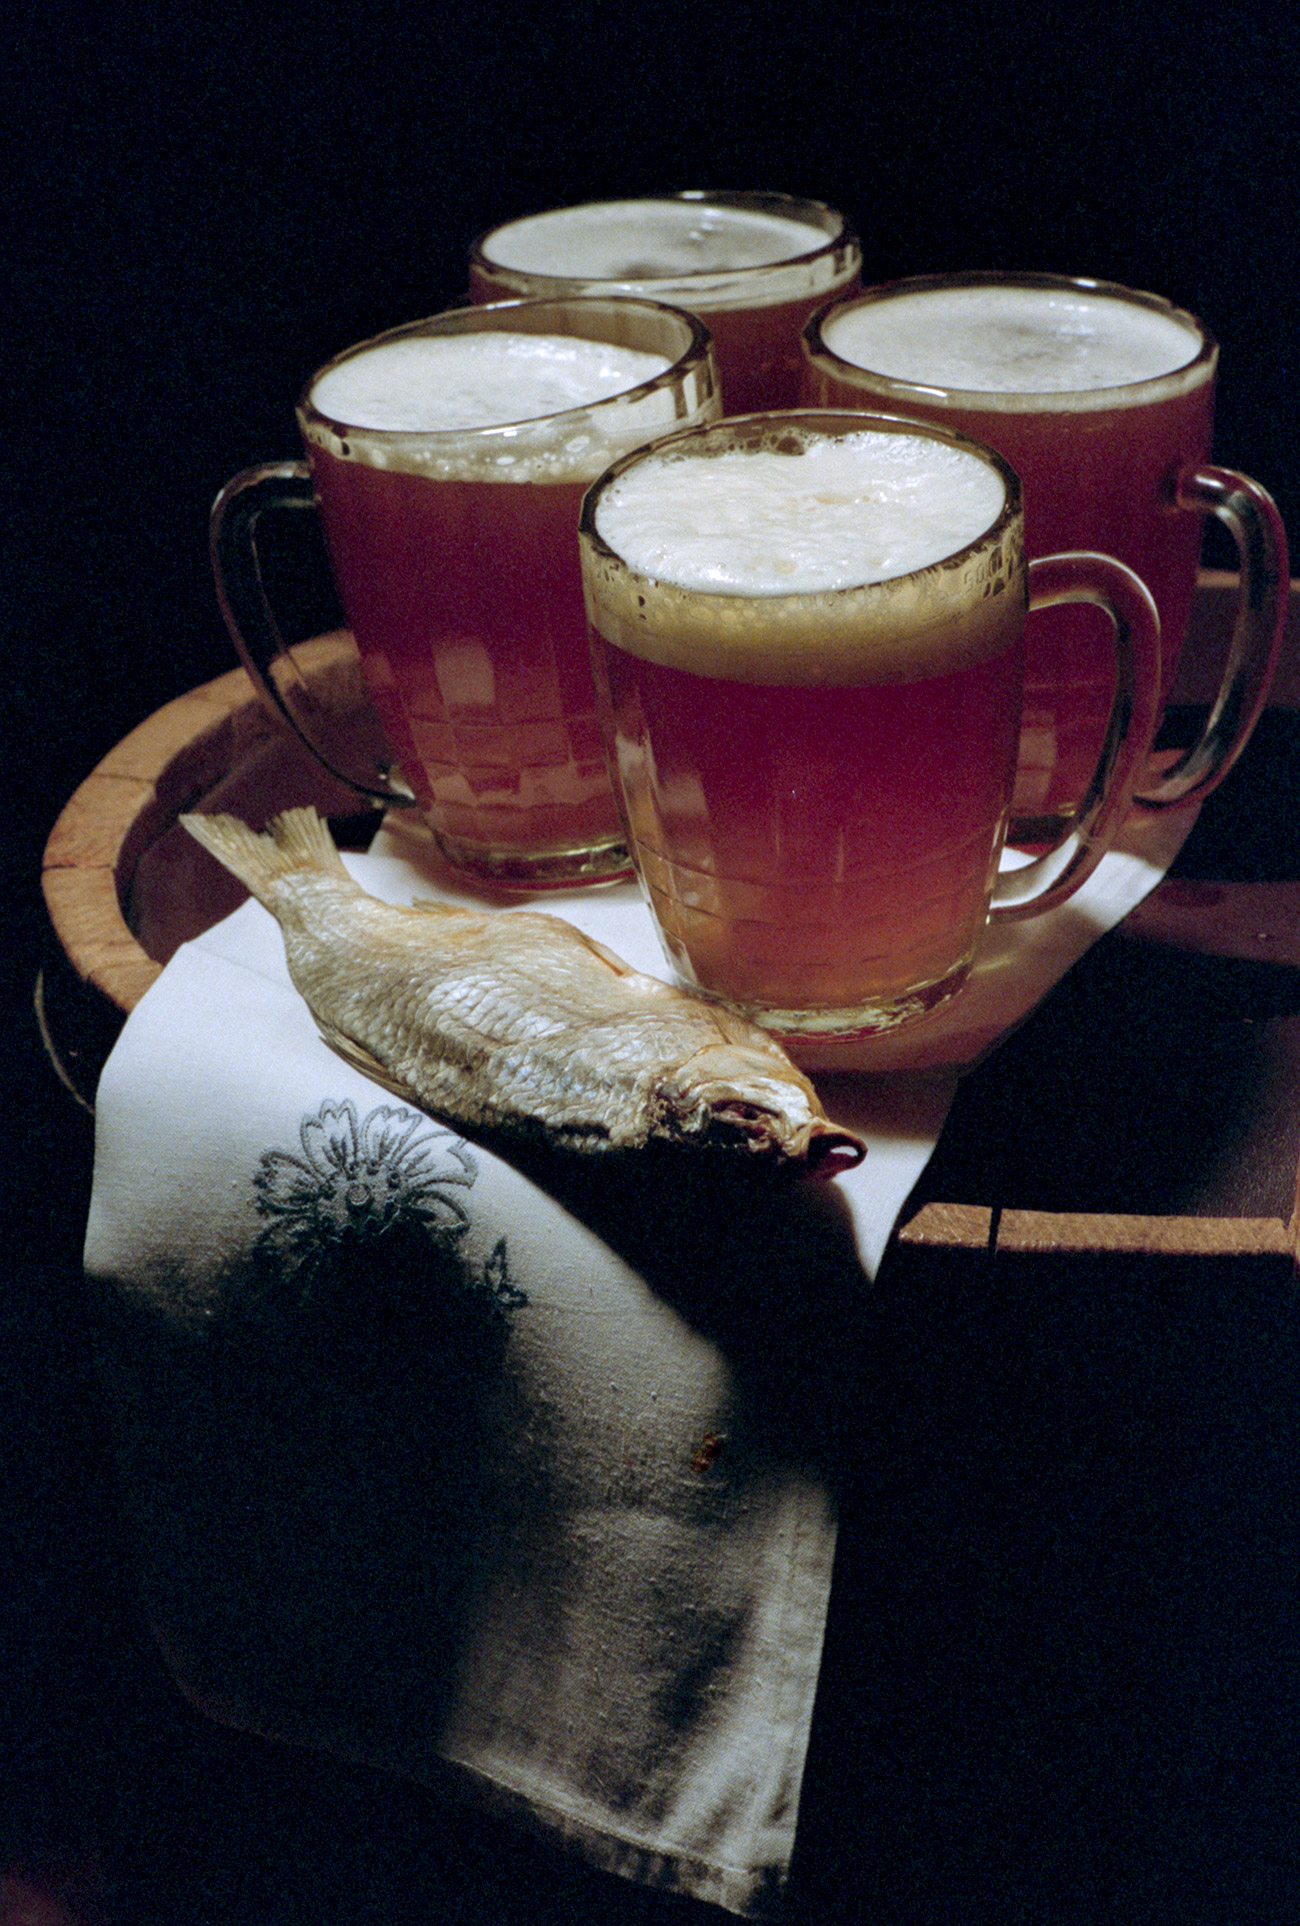 Баварско пиво произведено во руска пиварница. Извор: Владимир Веленгурин/TAСС